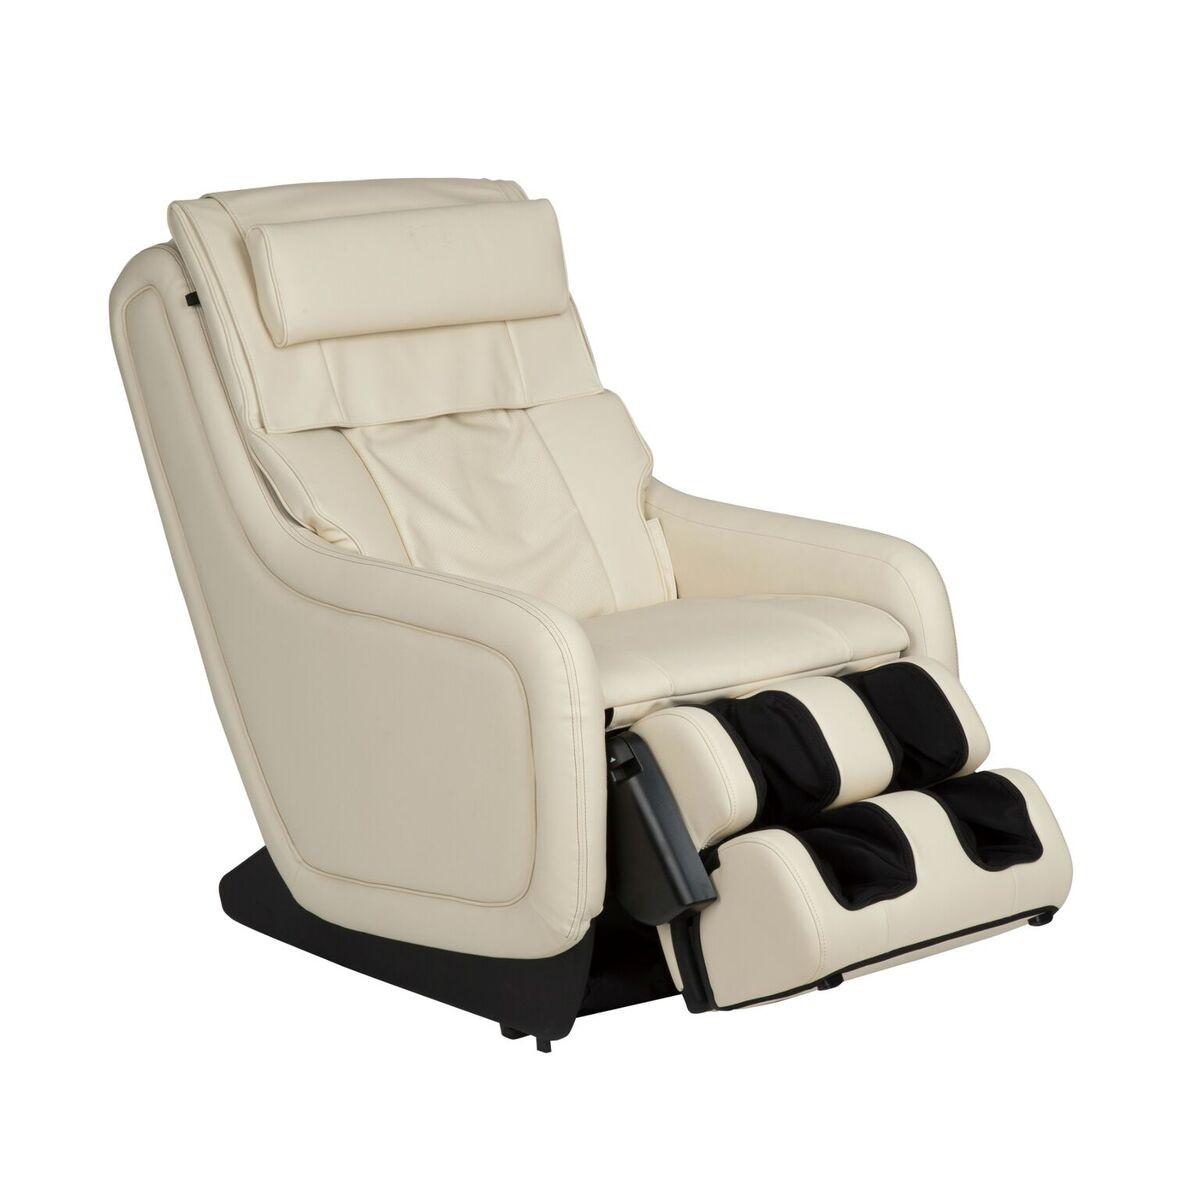 Fauteuil de massage AT 650 ZeroG 2